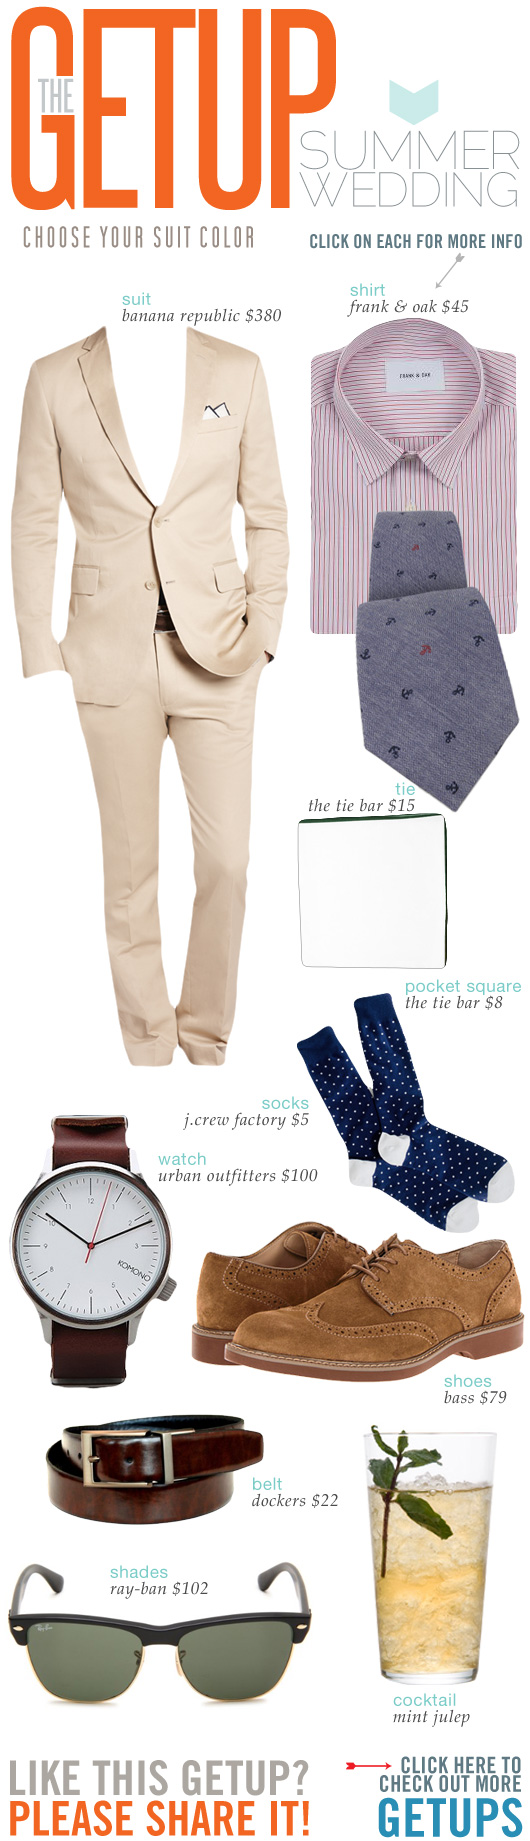 Getup Summer Wedding - Tan suit, pink shirt, blue tie